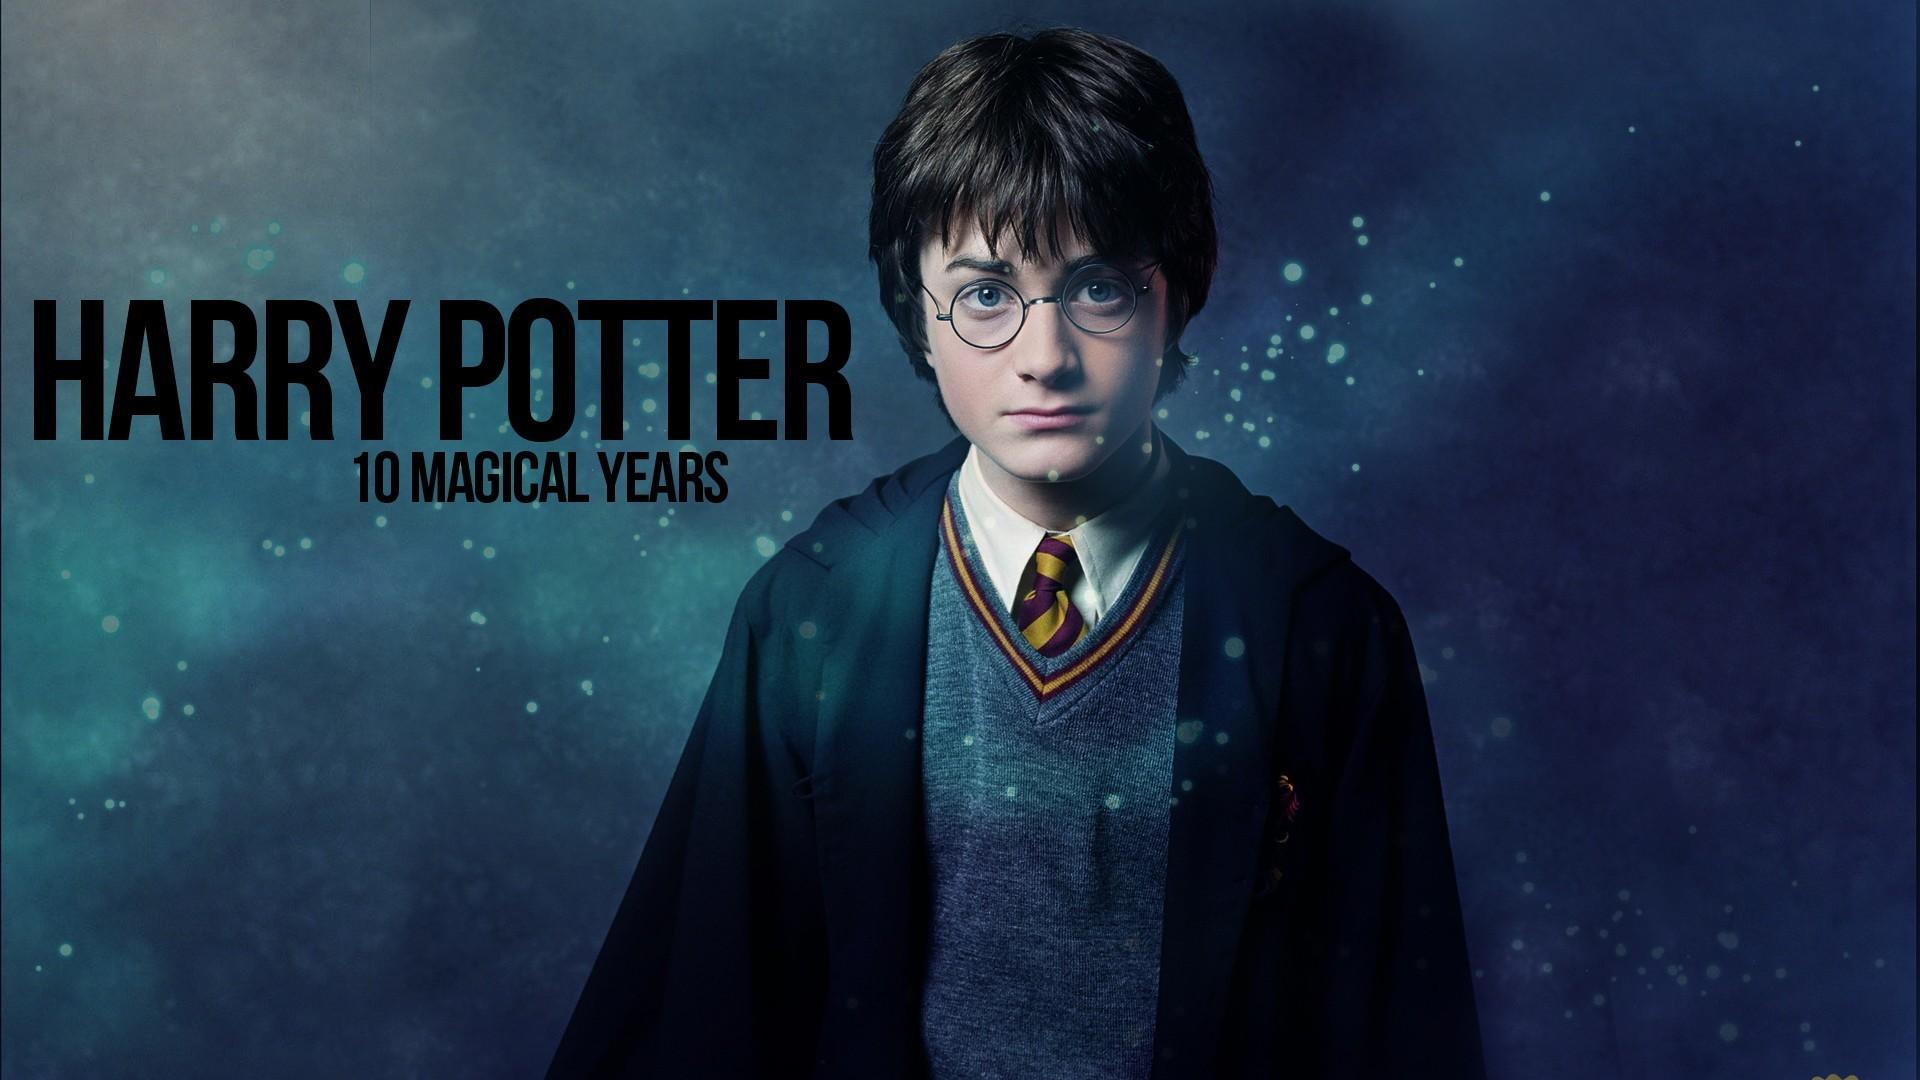 Download Harry Potter wallpaper (1920×1080)